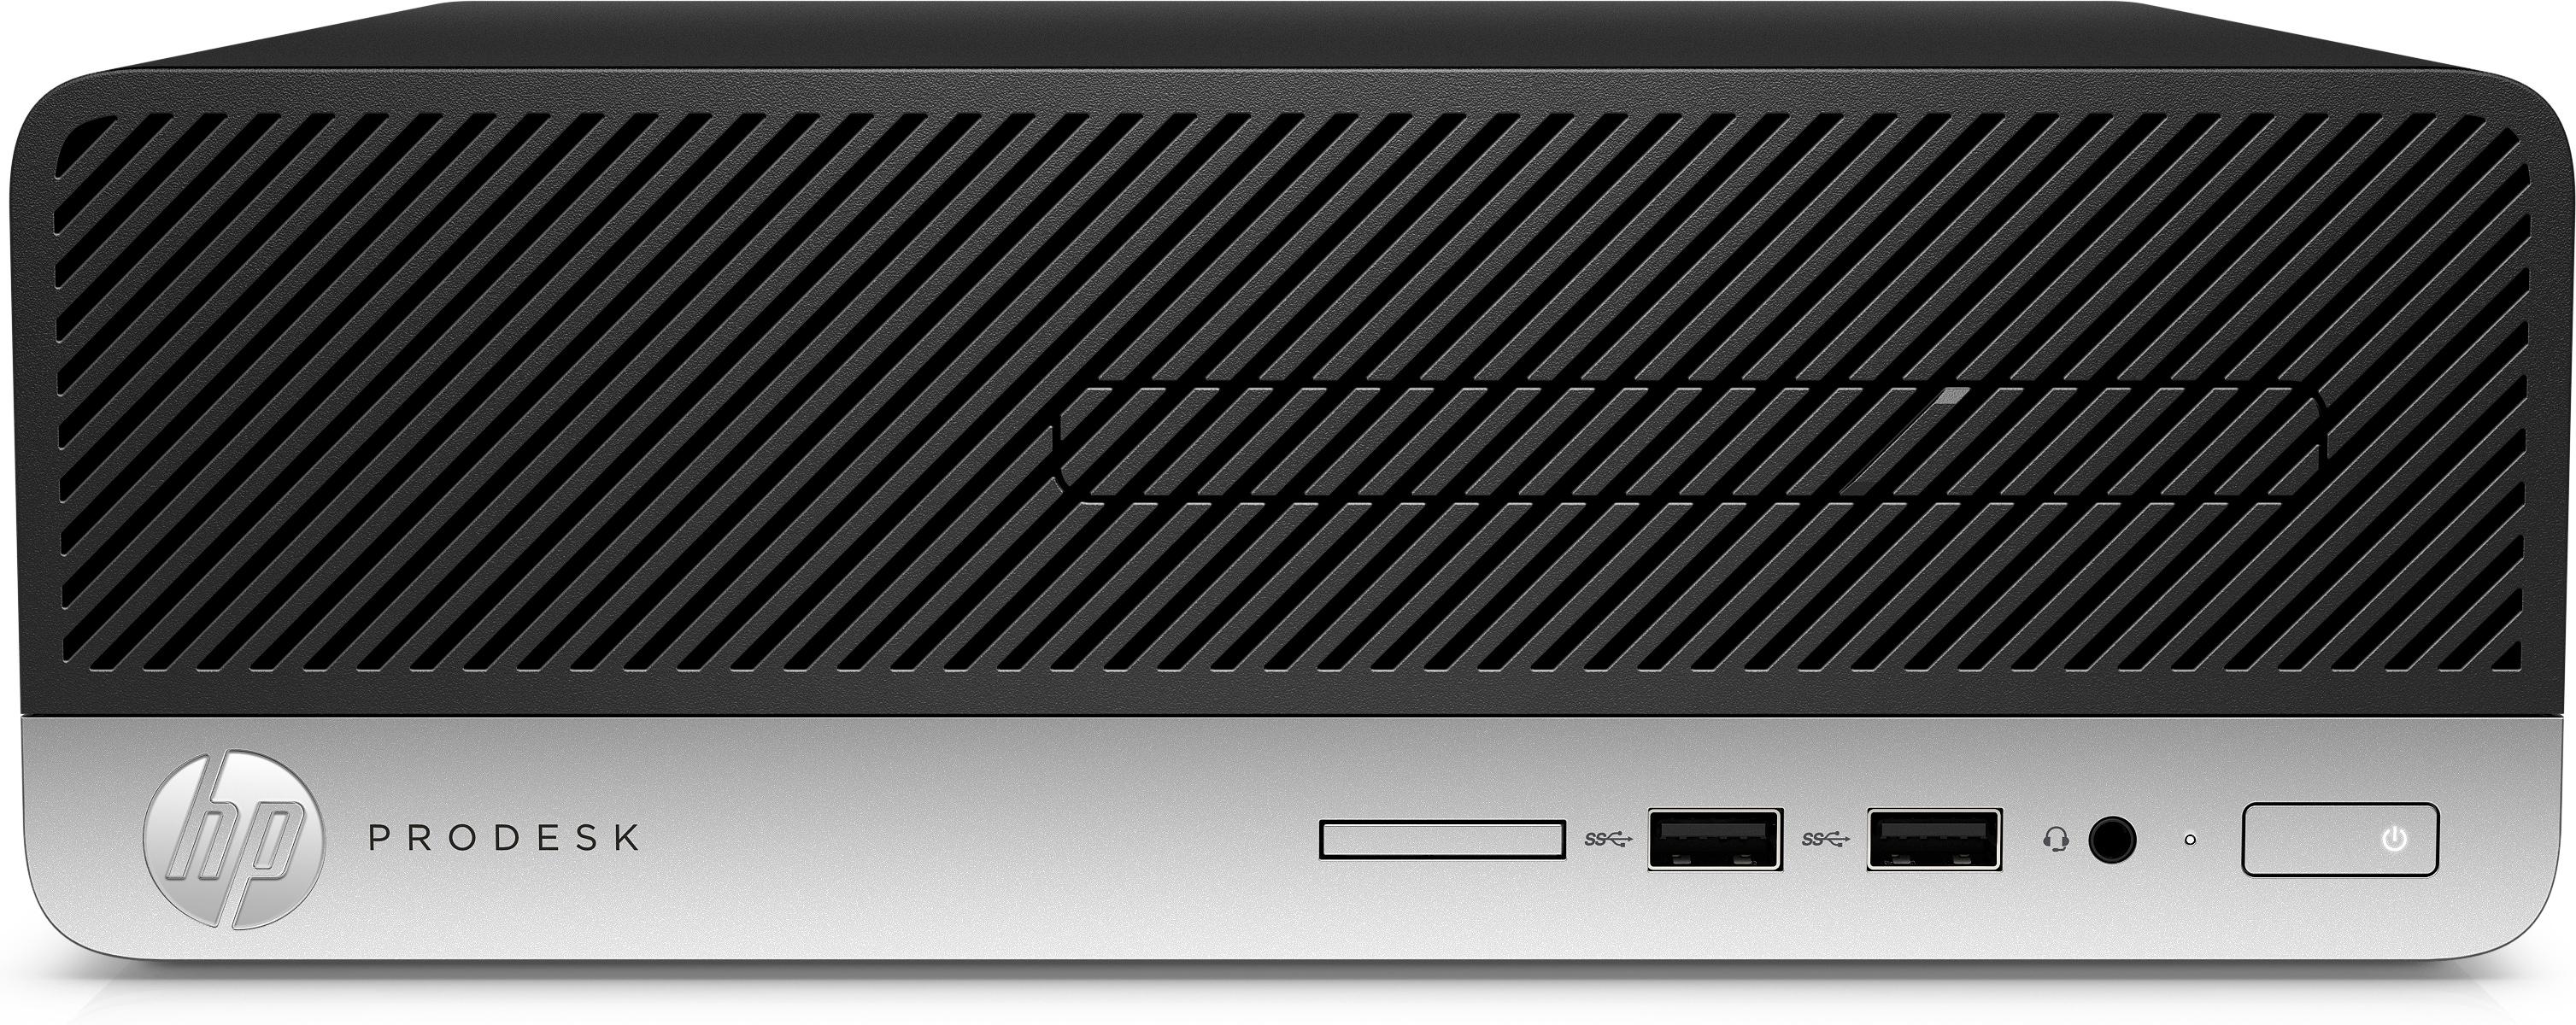 HP ProDesk 400 G6 - Komplettsystem - Core i3 3,6 GHz - RAM: 8 GB DDR4 - HDD: 256 GB NVMe - UHD Graphics 600